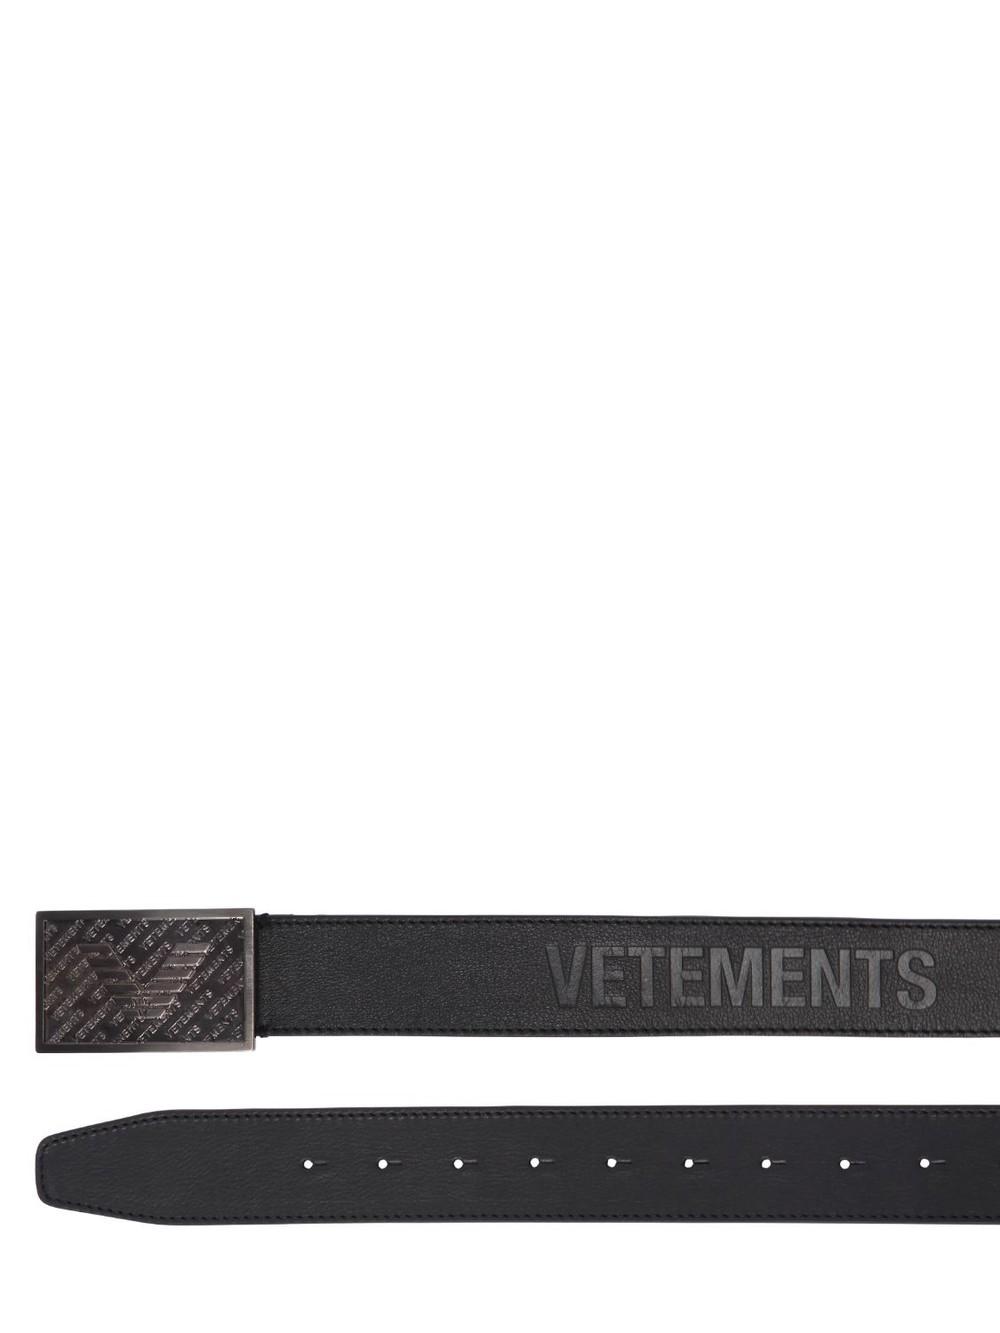 VETEMENTS Bouncer Leather Belt in black